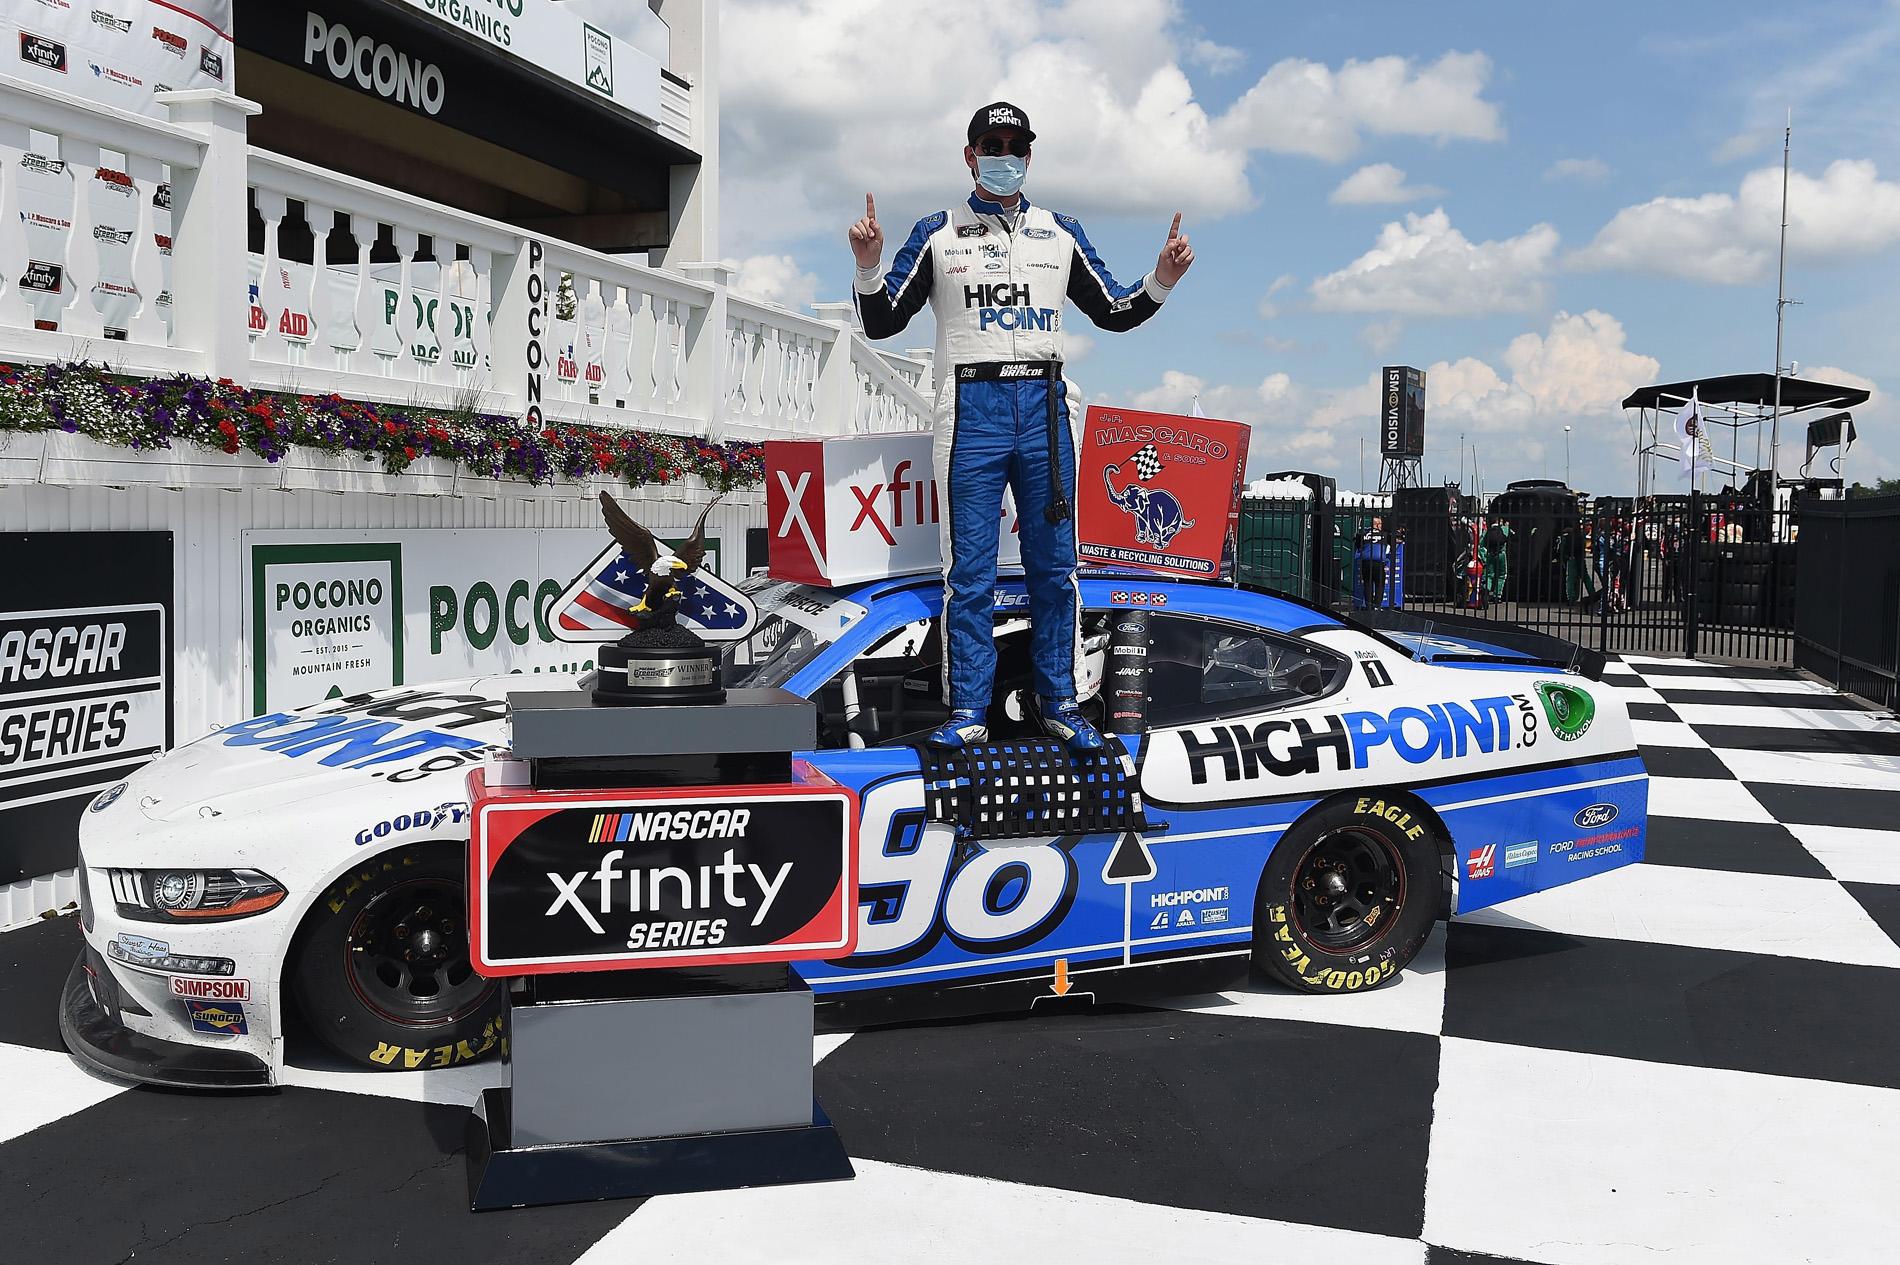 NASCAR Xfinity Series Pocono Green 225 Recycled by J.P. Mascaro & Sons